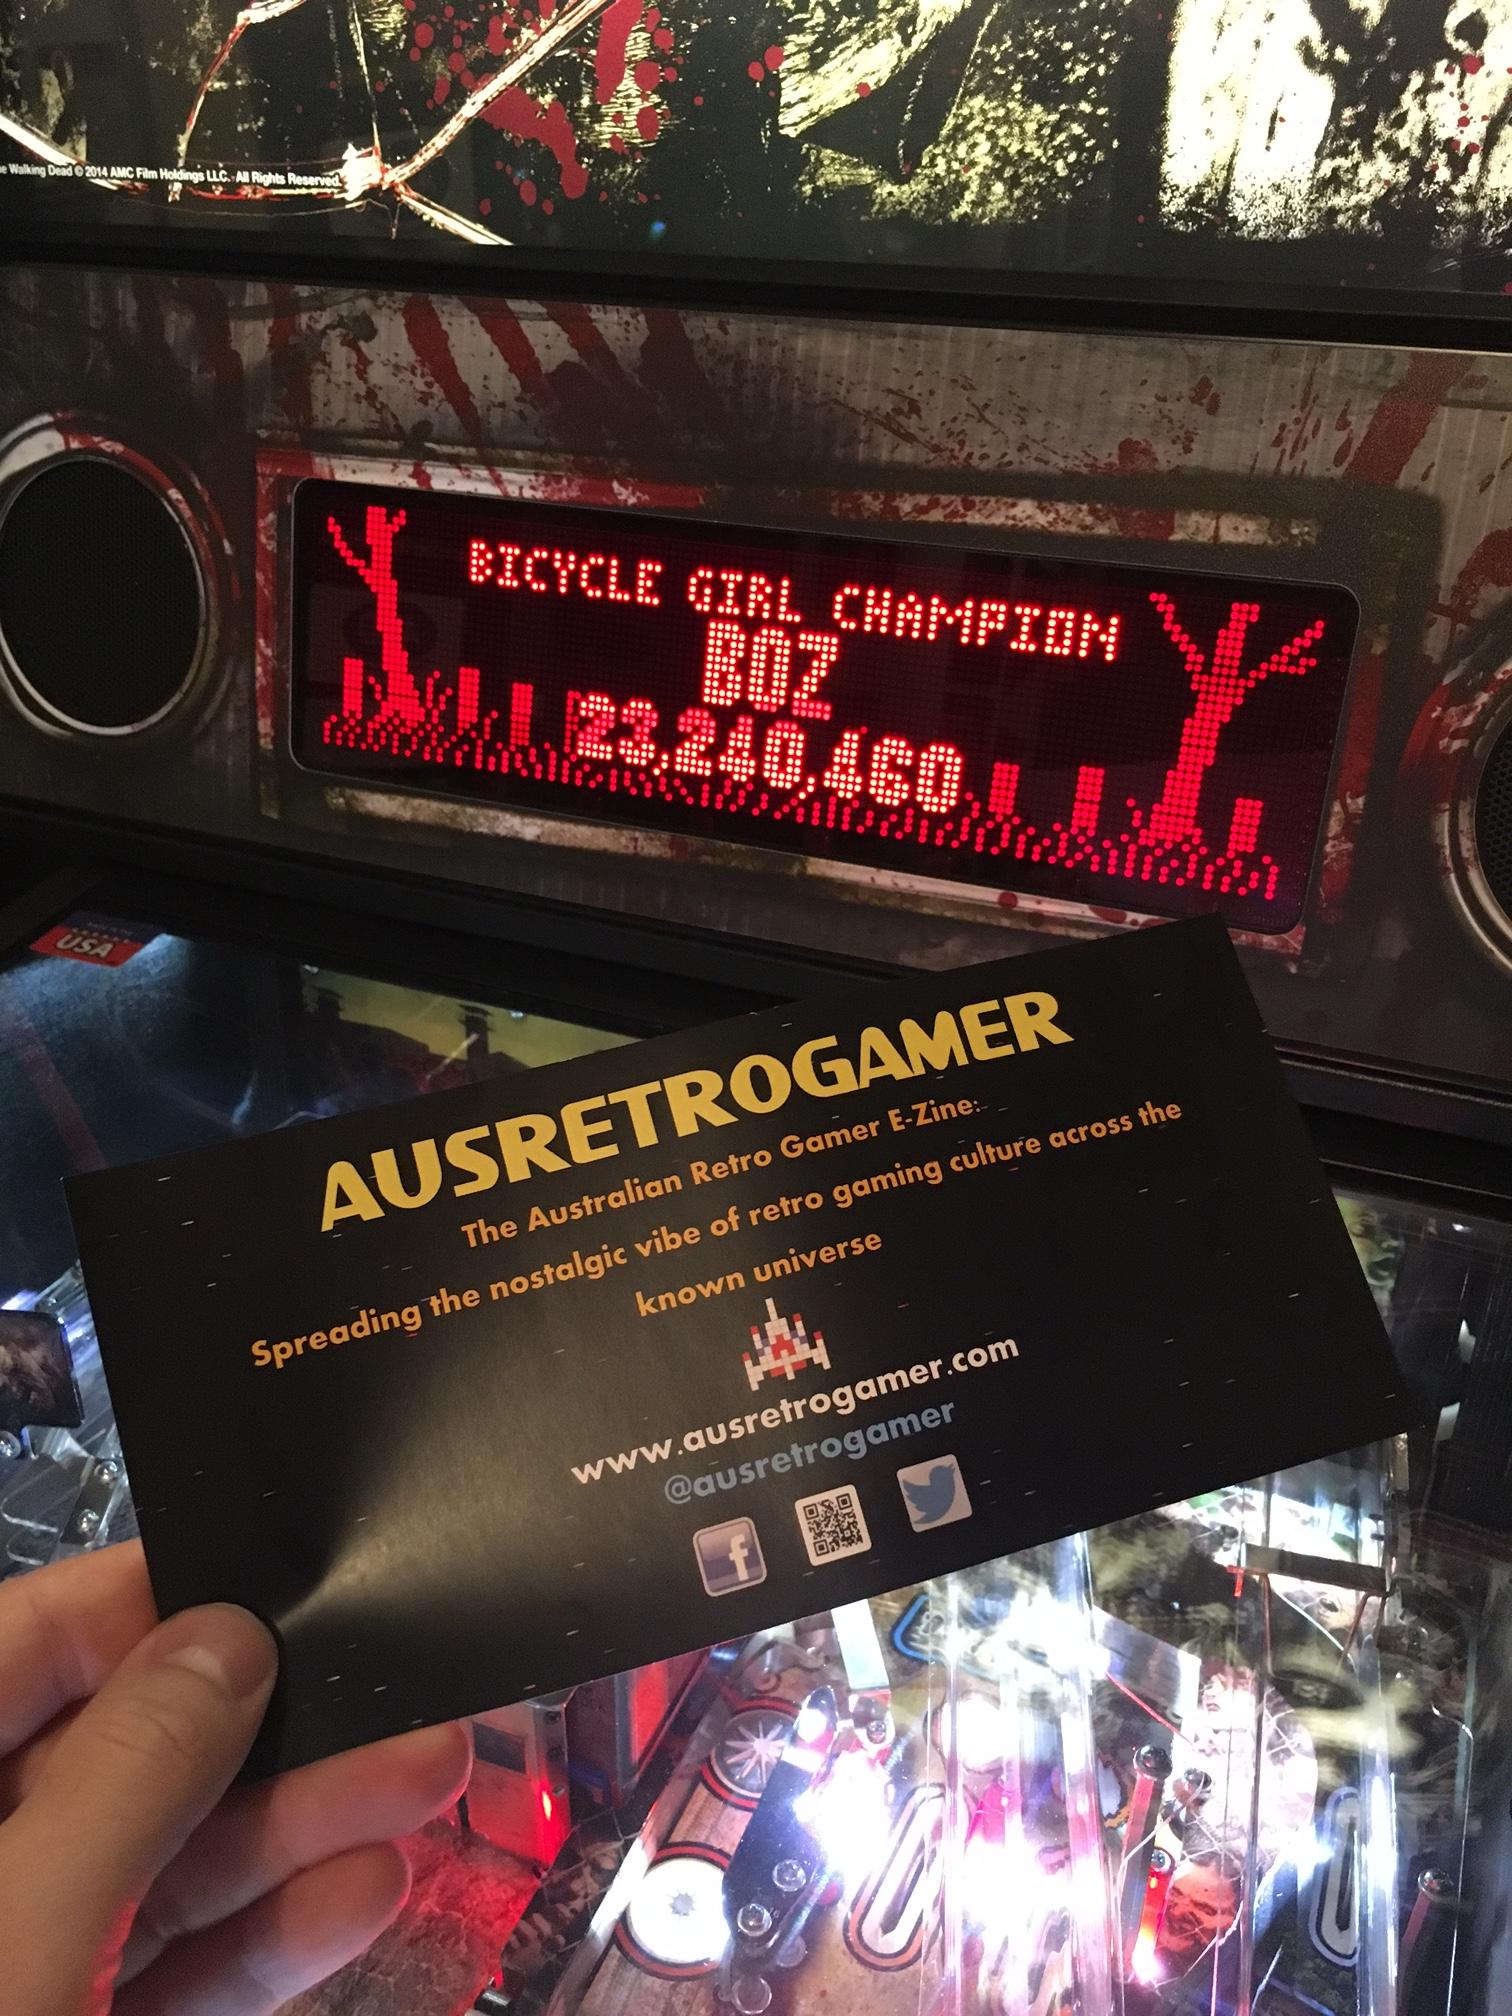 ausretrogamer: The Walking Dead: Bicycle Girl Champion (Pinball Bonus Mode) 23,240,460 points on 2017-04-23 21:30:59